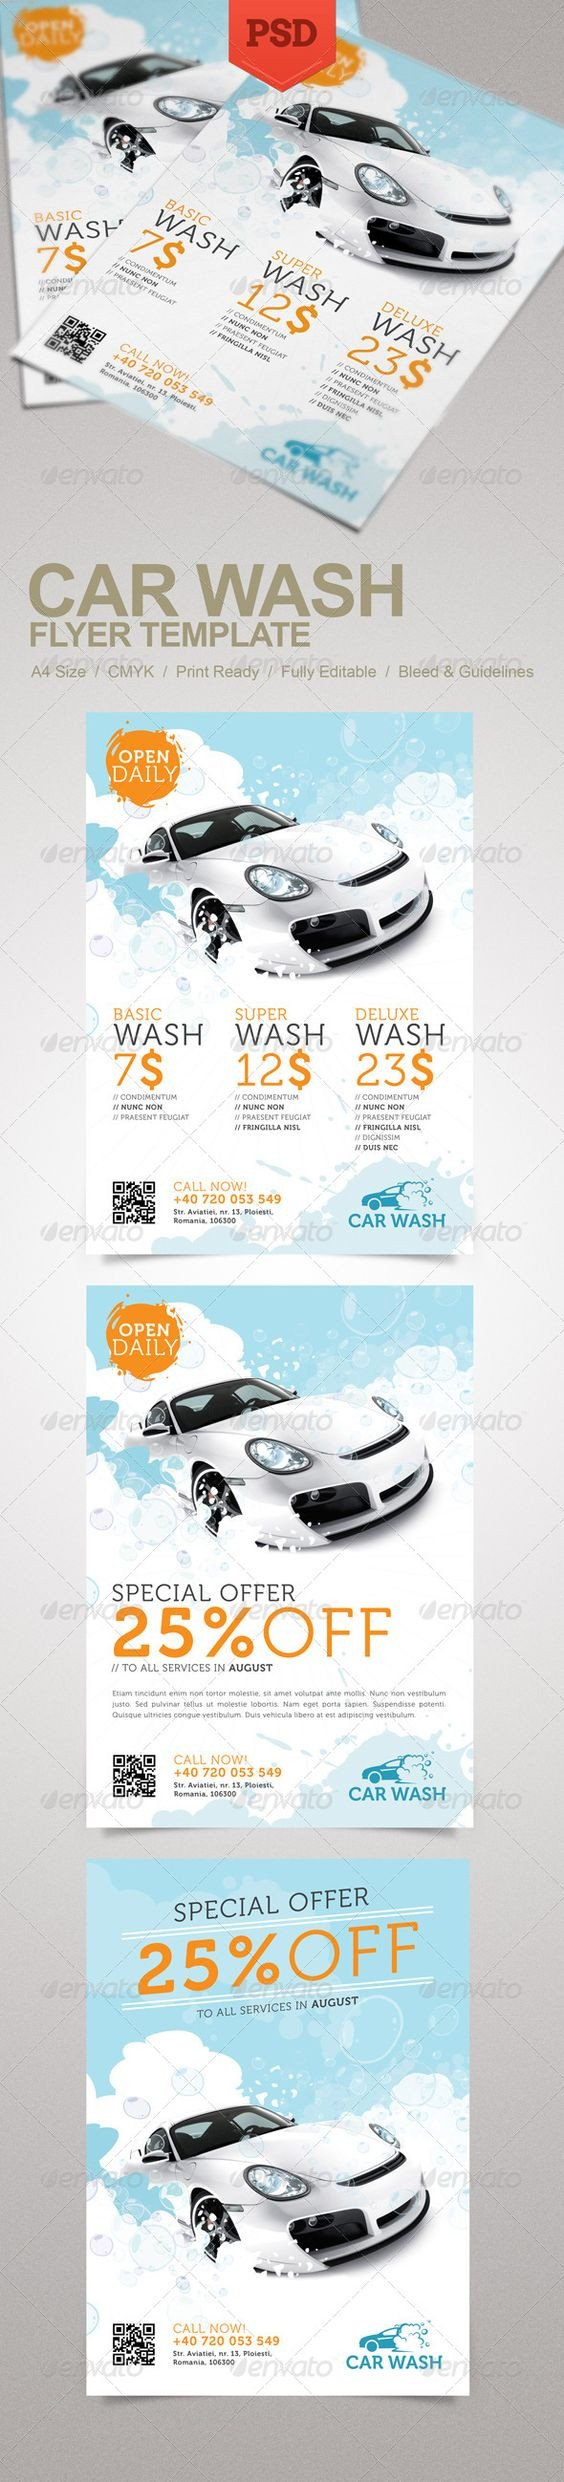 Car Wash Flyers Template Car Wash Flyer